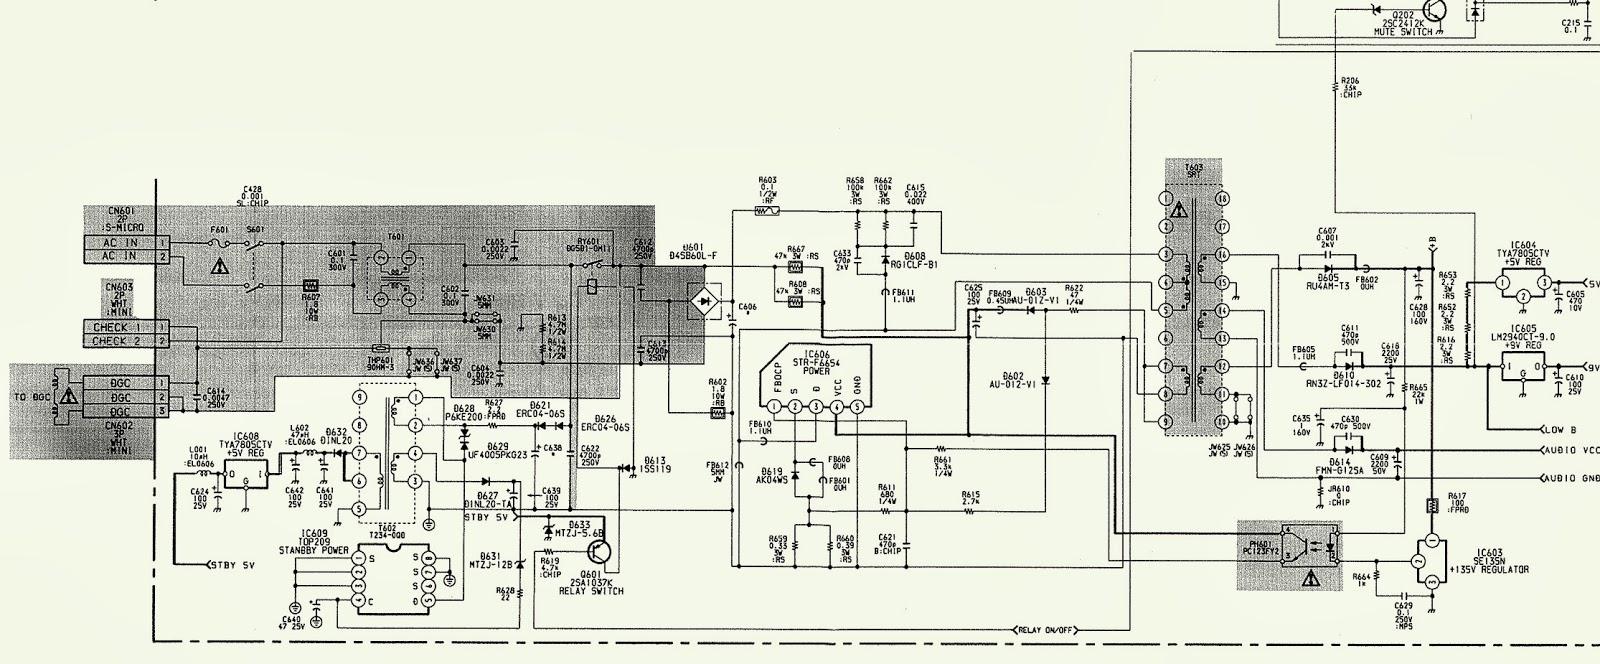 SONY TRINITRON  KV 25R**  COLOR TV  SCHEMATIC  POWER